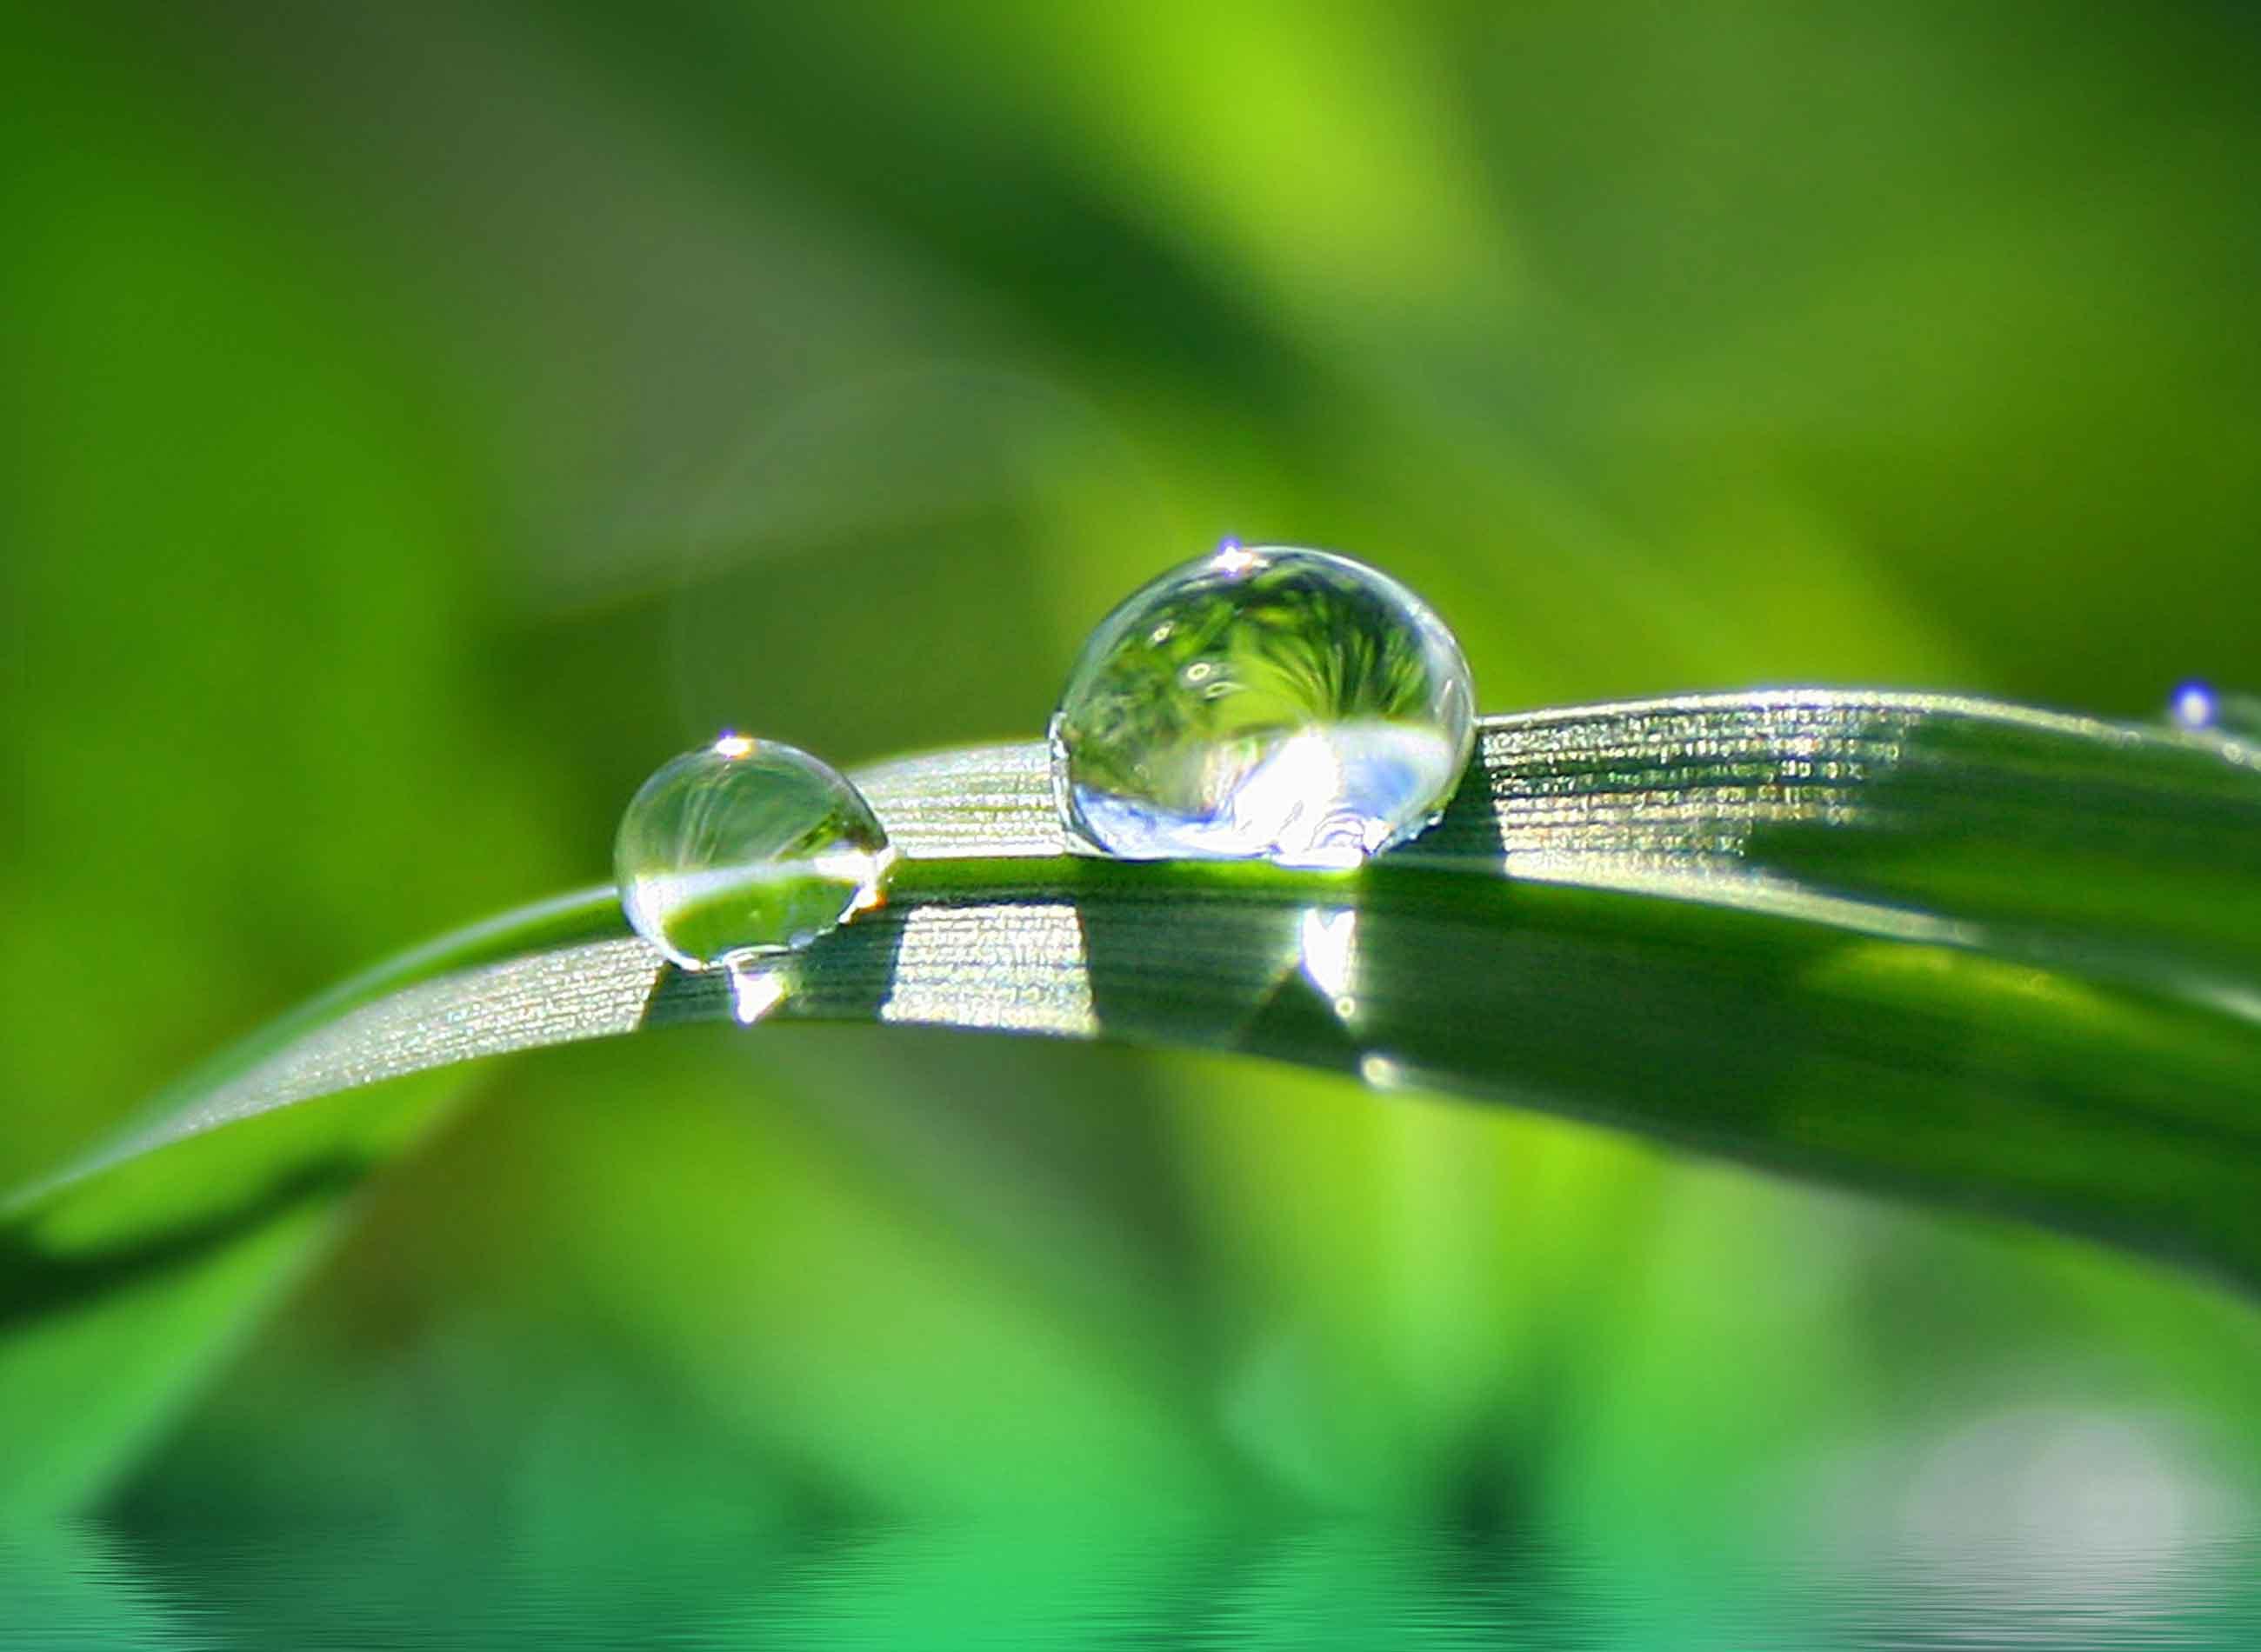 Jardinier paysagiste lille cr ation entretien jardin for Creation espace vert